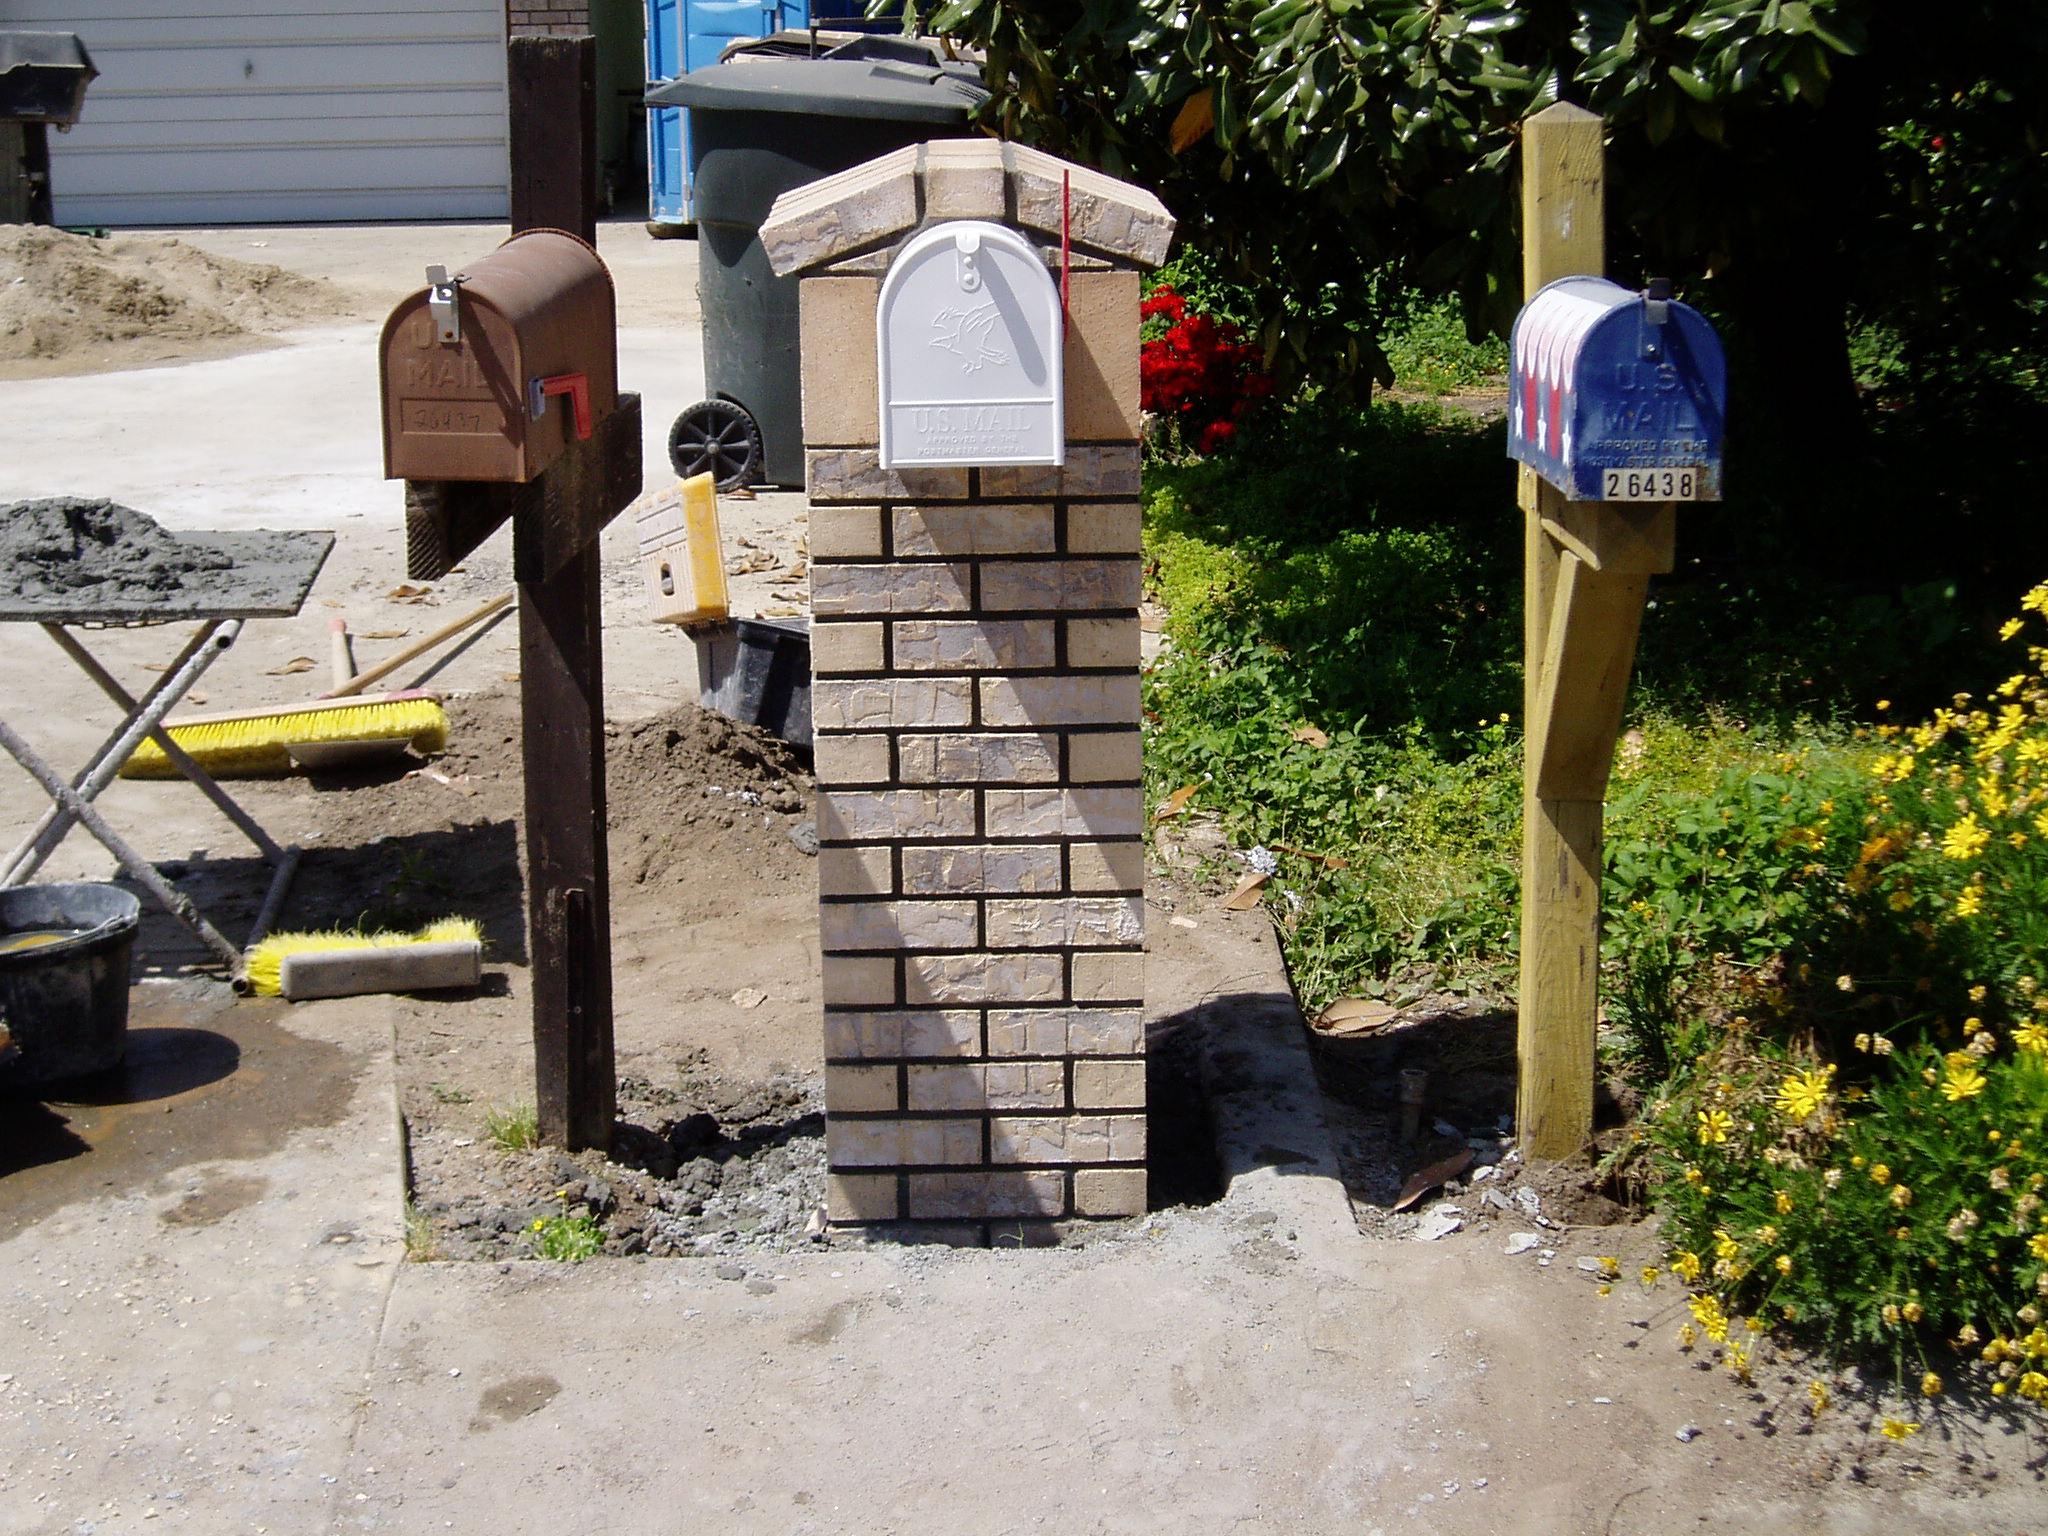 Brick Mailbox Castle Mist